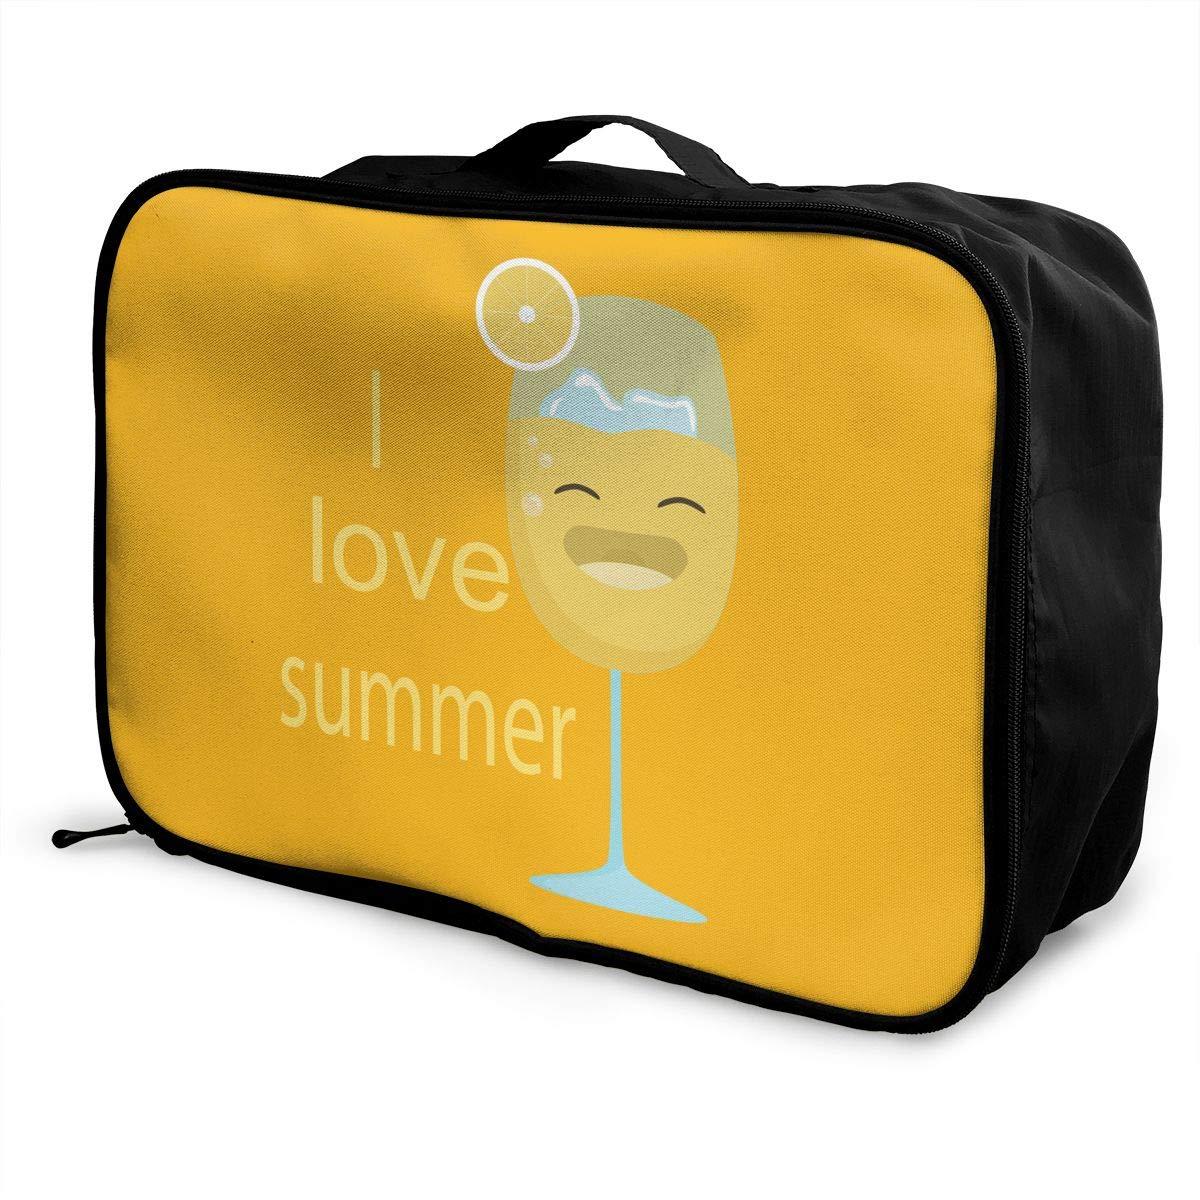 Travel Luggage Duffle Bag Lightweight Portable Handbag Love Summer Large Capacity Waterproof Foldable Storage Tote